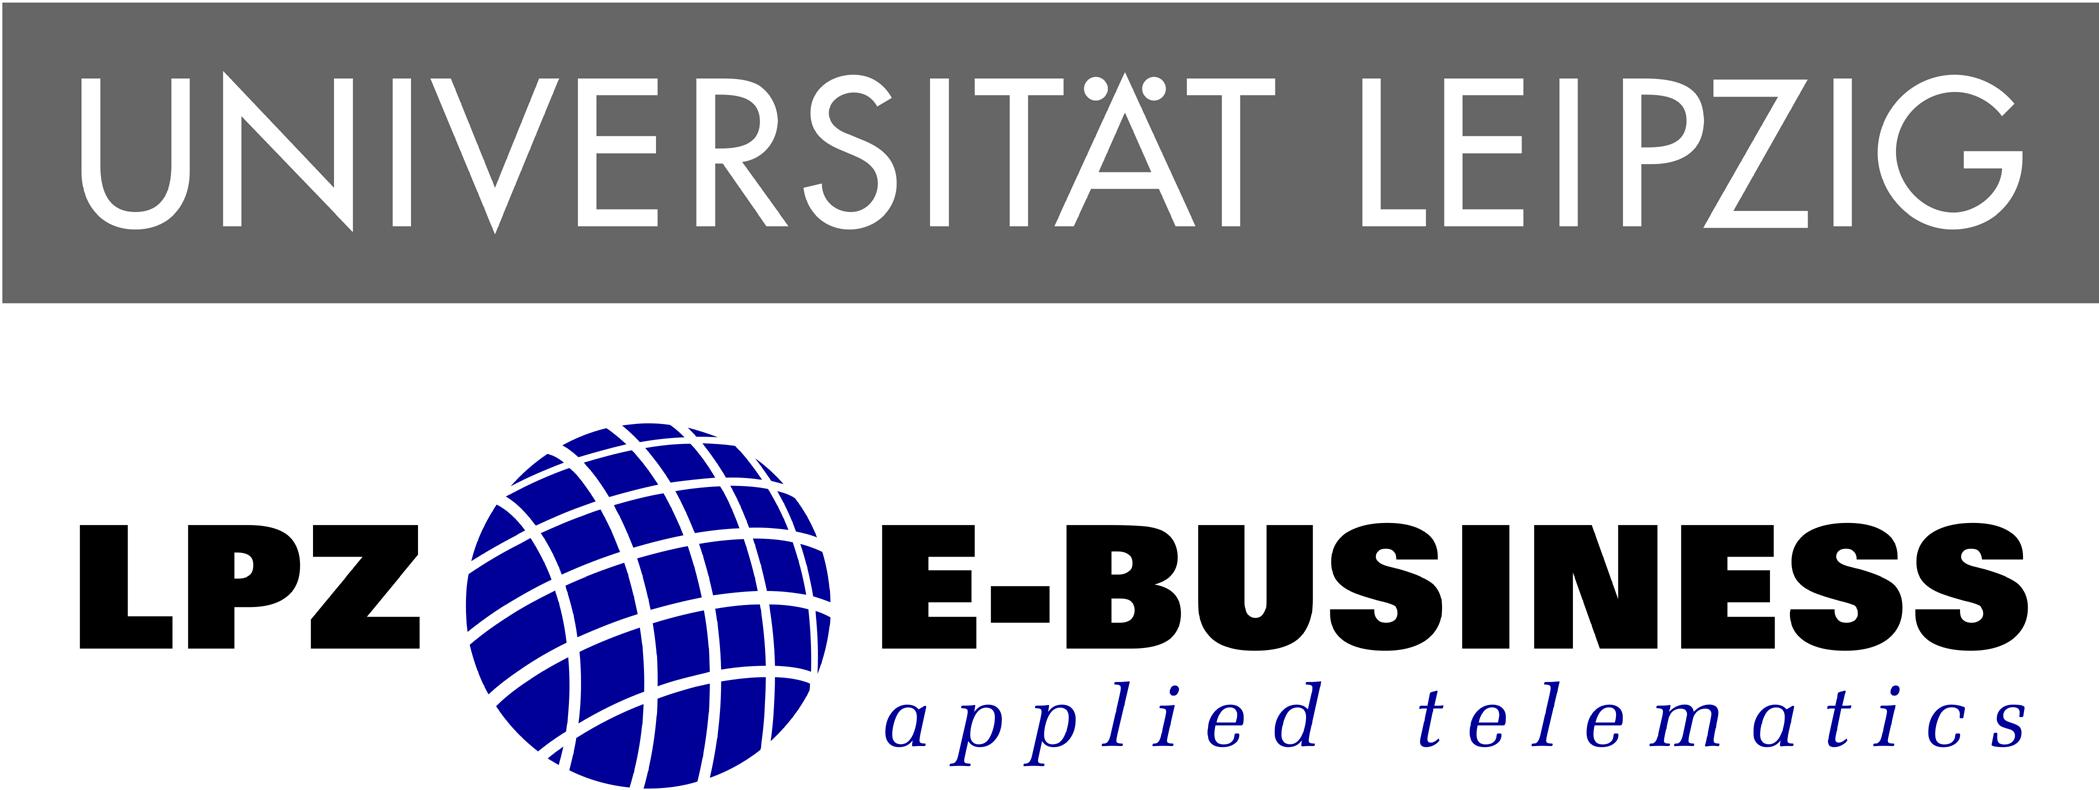 Lehrstuhl für Angewandte Telematik / e-Business an der Universität Leipzig